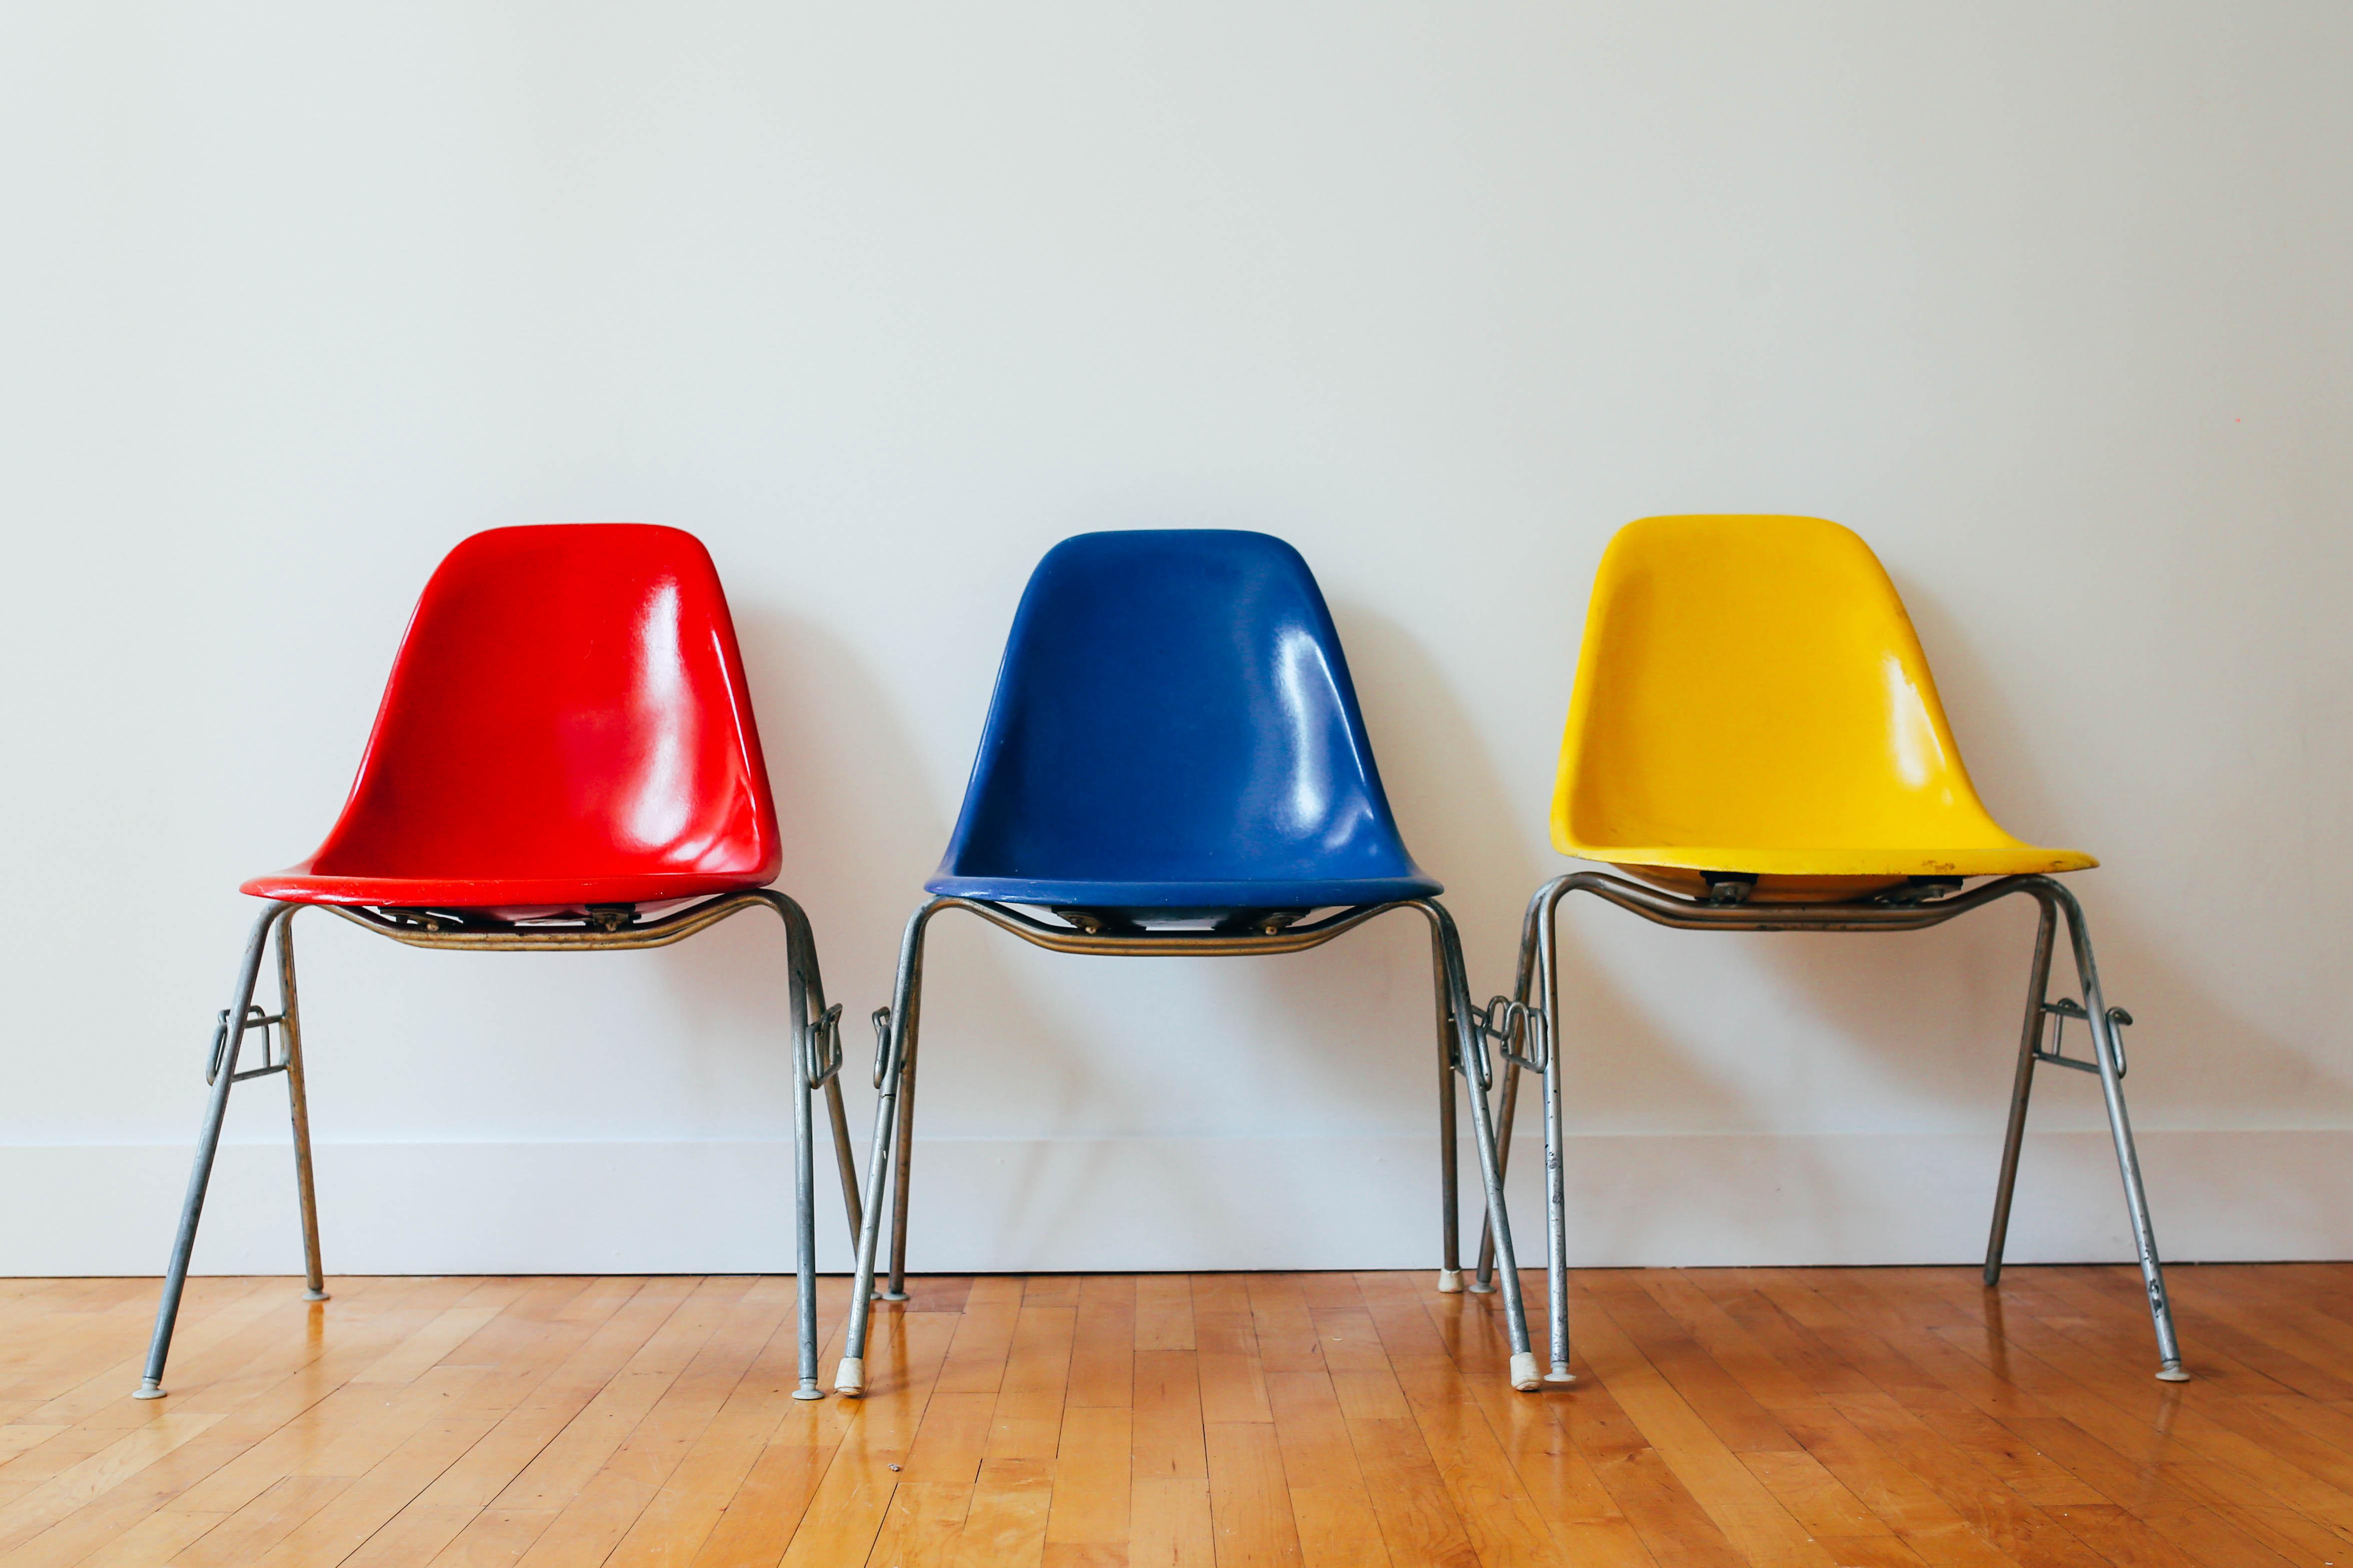 webinar-chairs